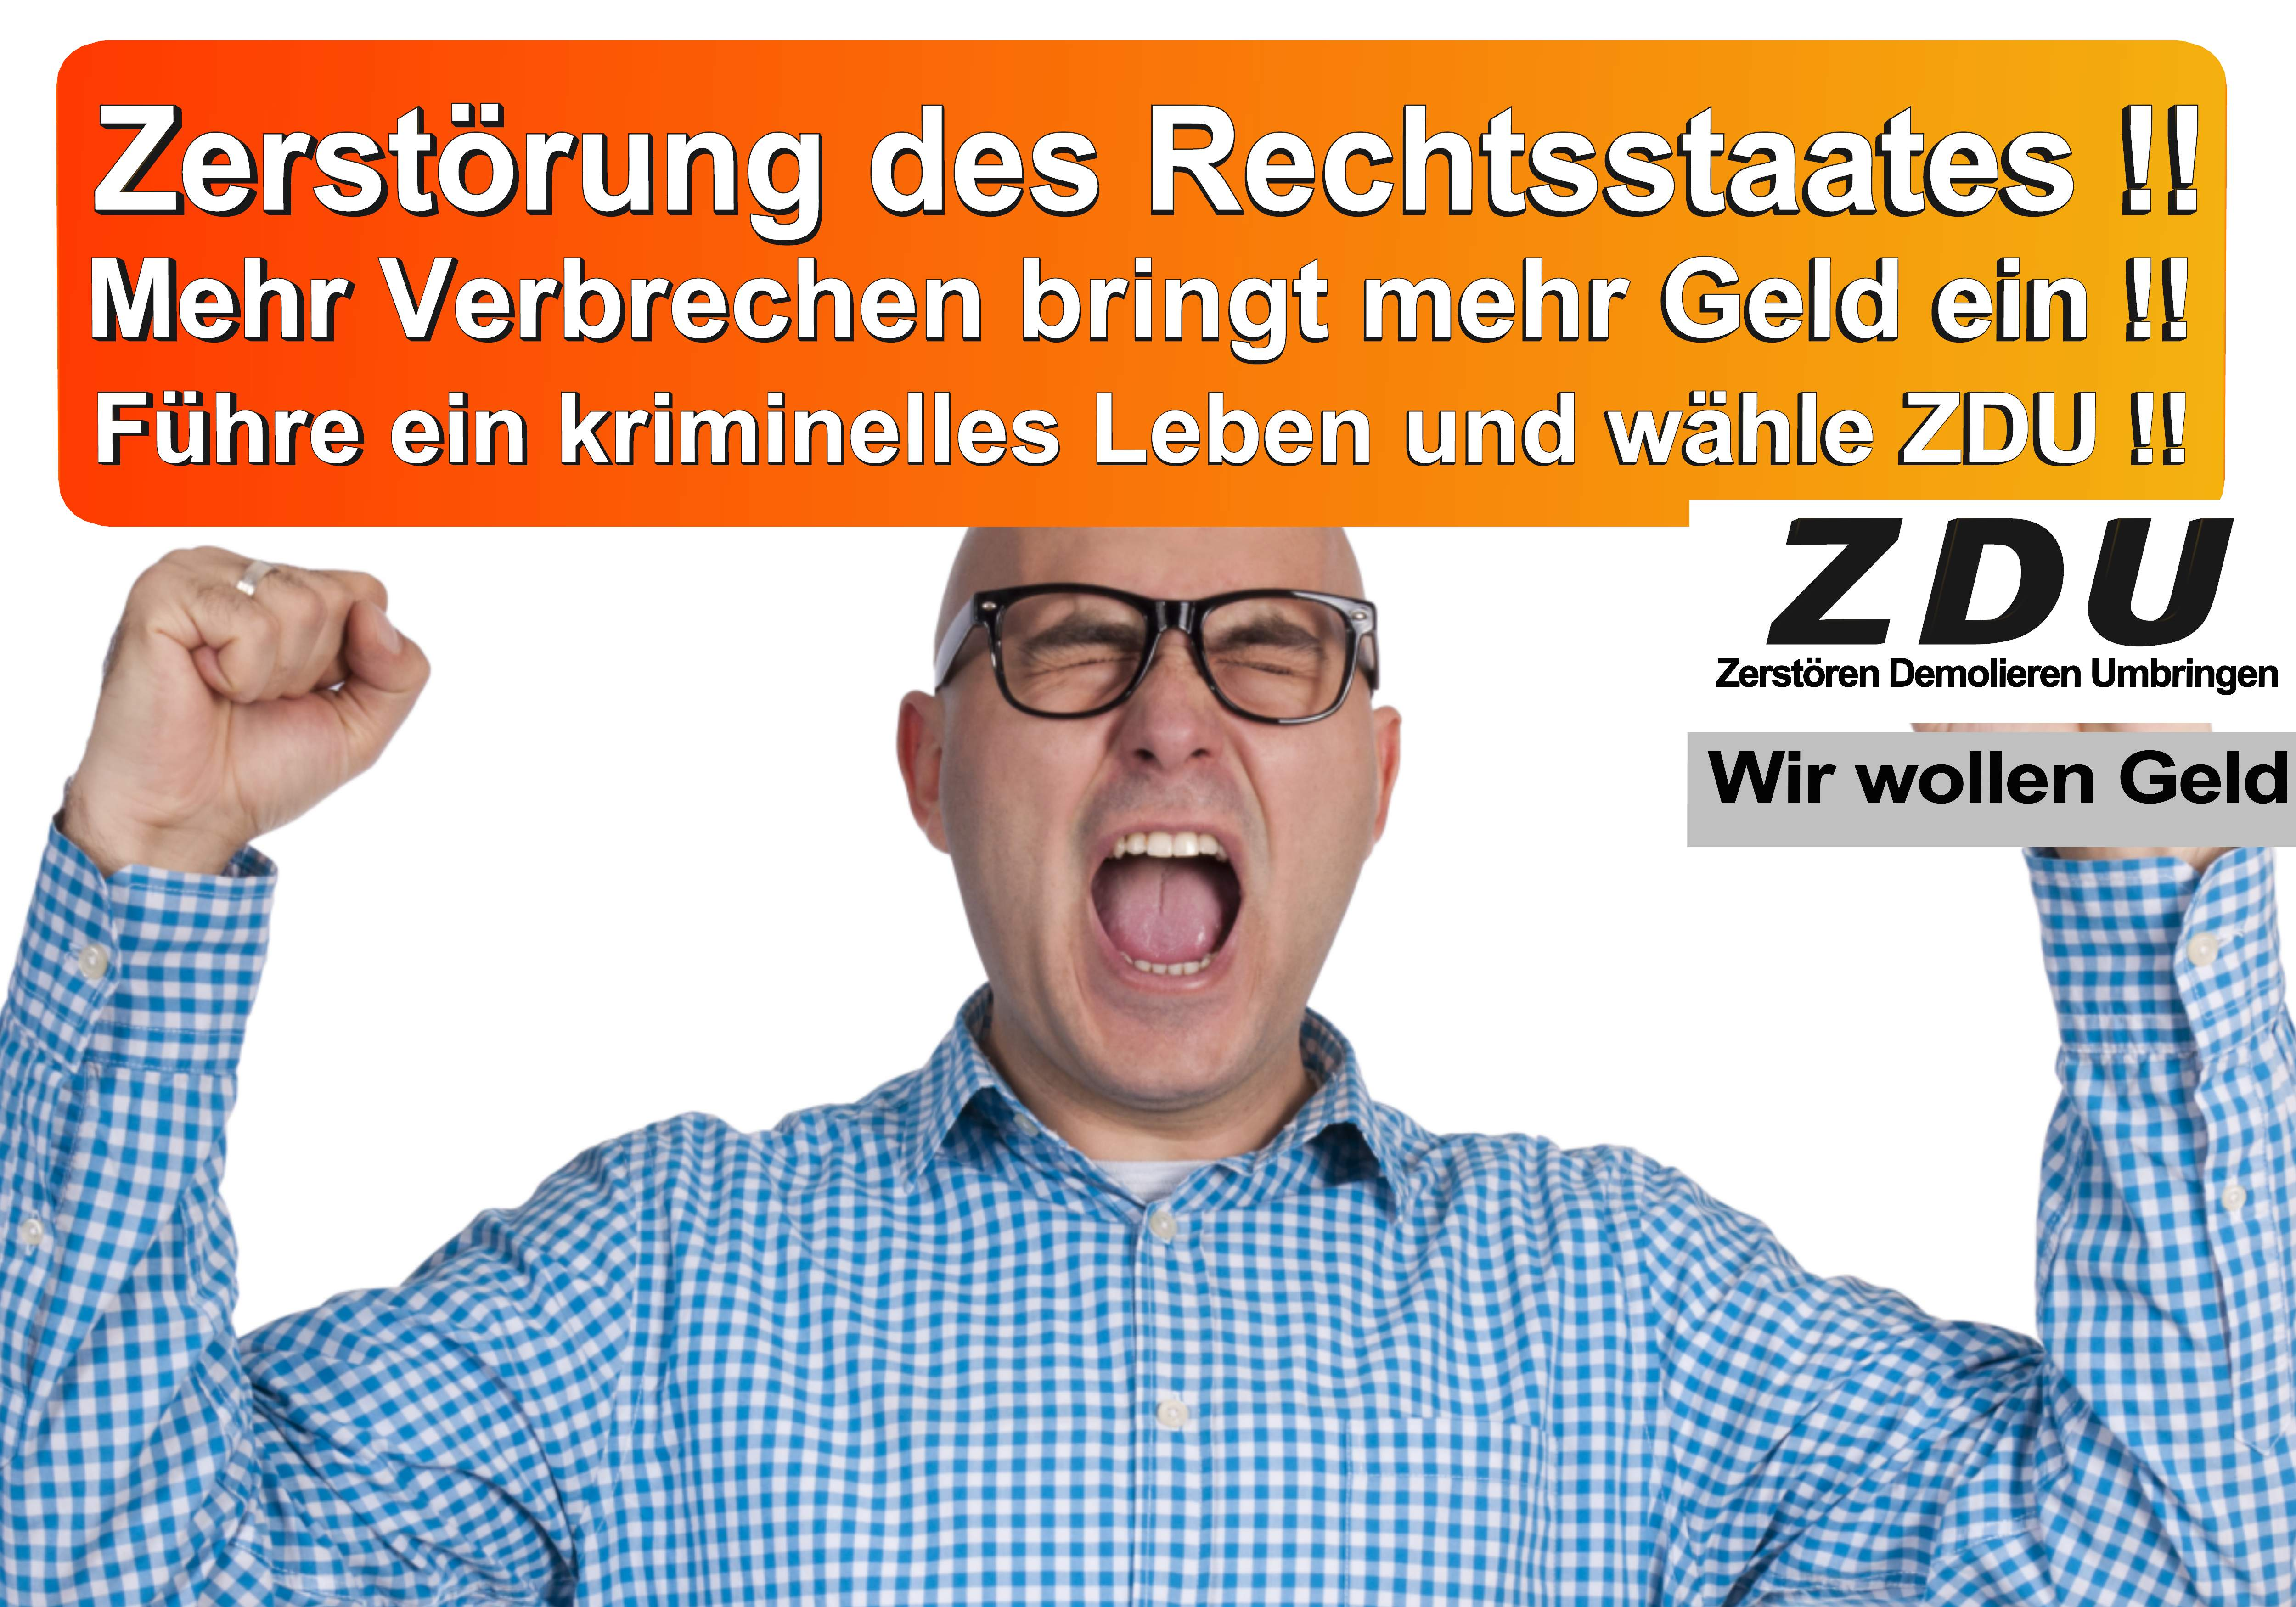 Bundestagswahl 2017 CDU SPD AfD Wahlplakat Angela Merkel CDU CSU (9)